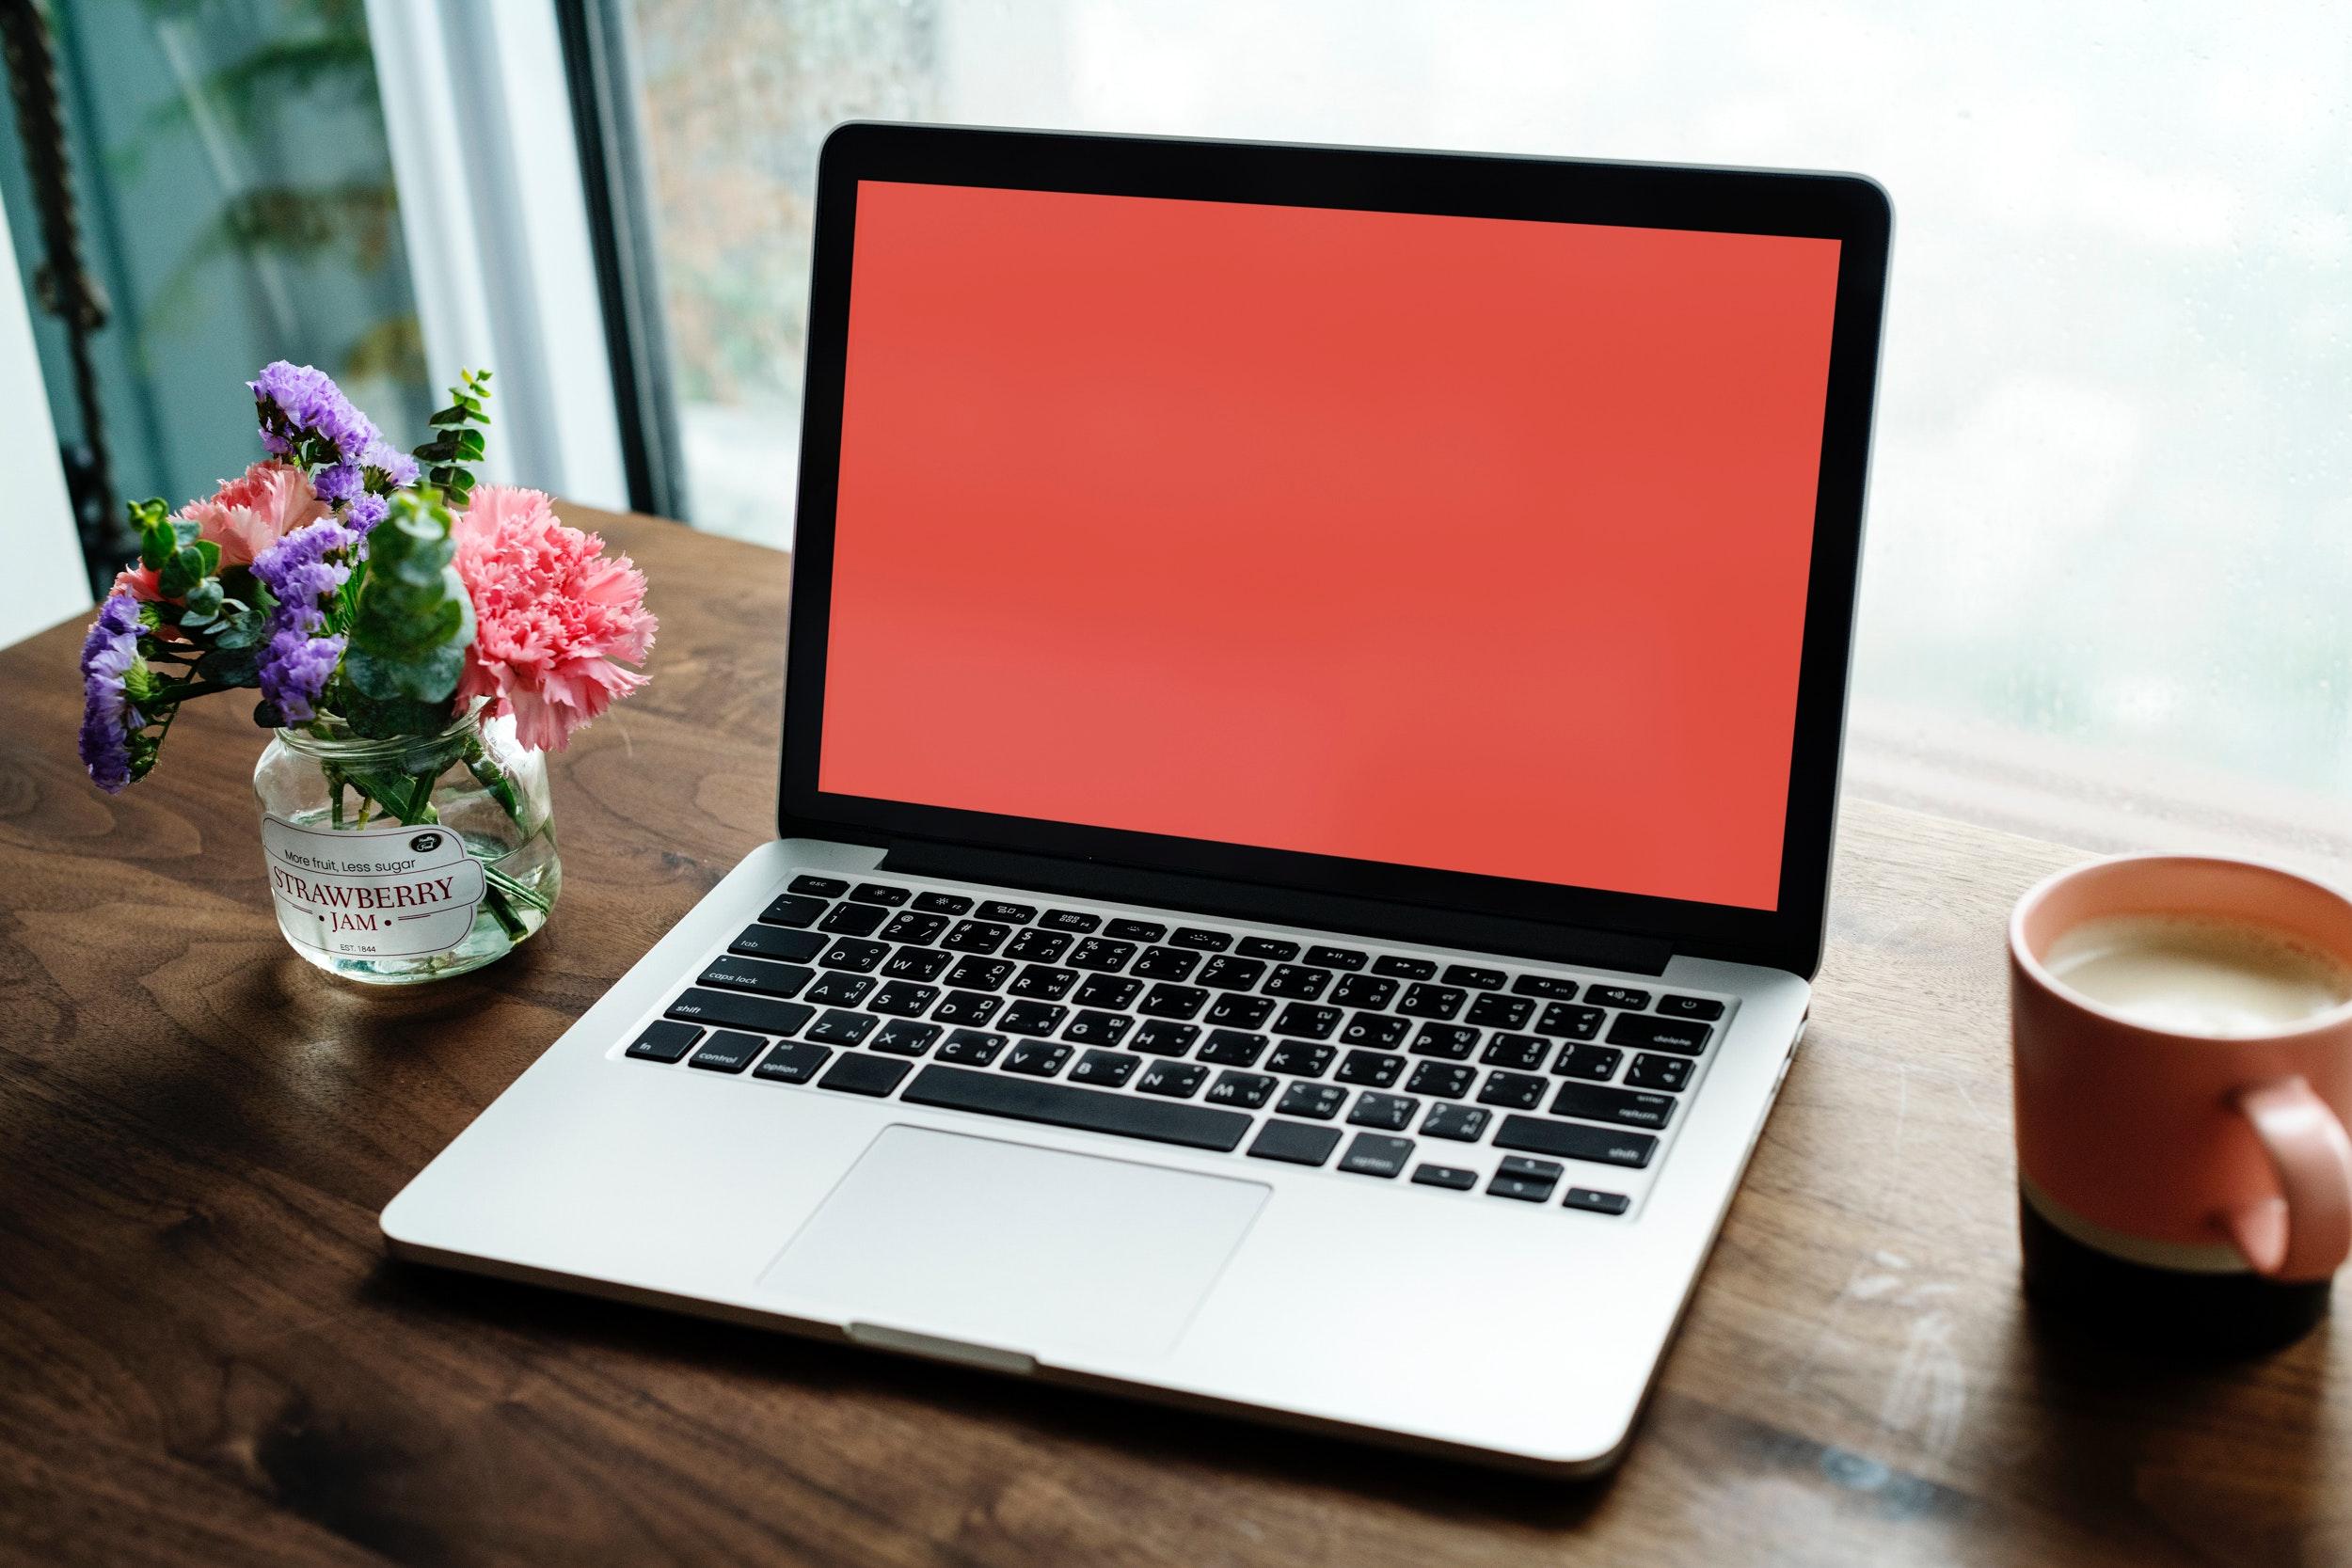 background-blog-business-997723.jpg